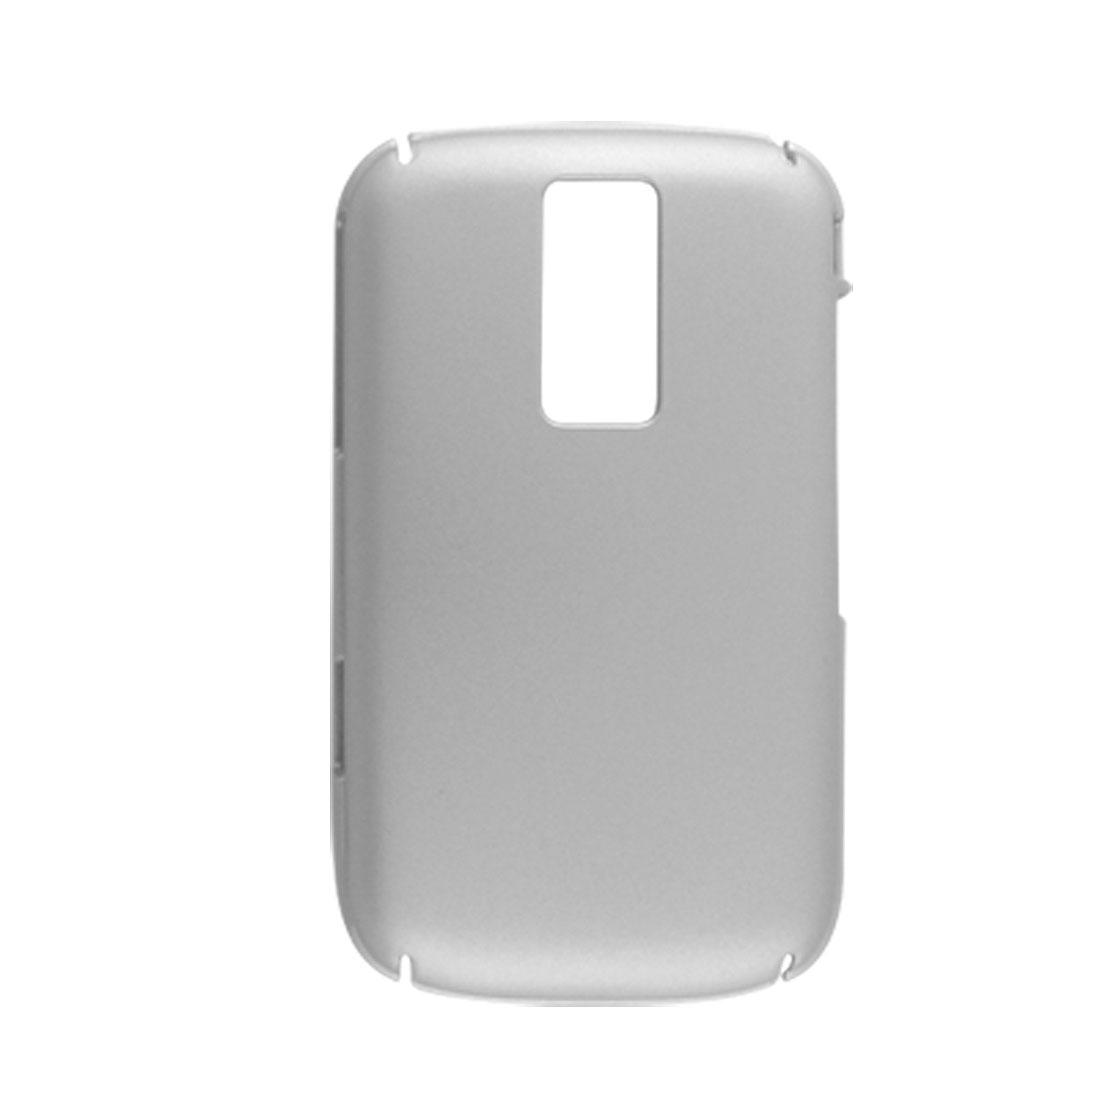 Silver Tone Rubberized Hard Plastic Back Case for Blackberry 9000